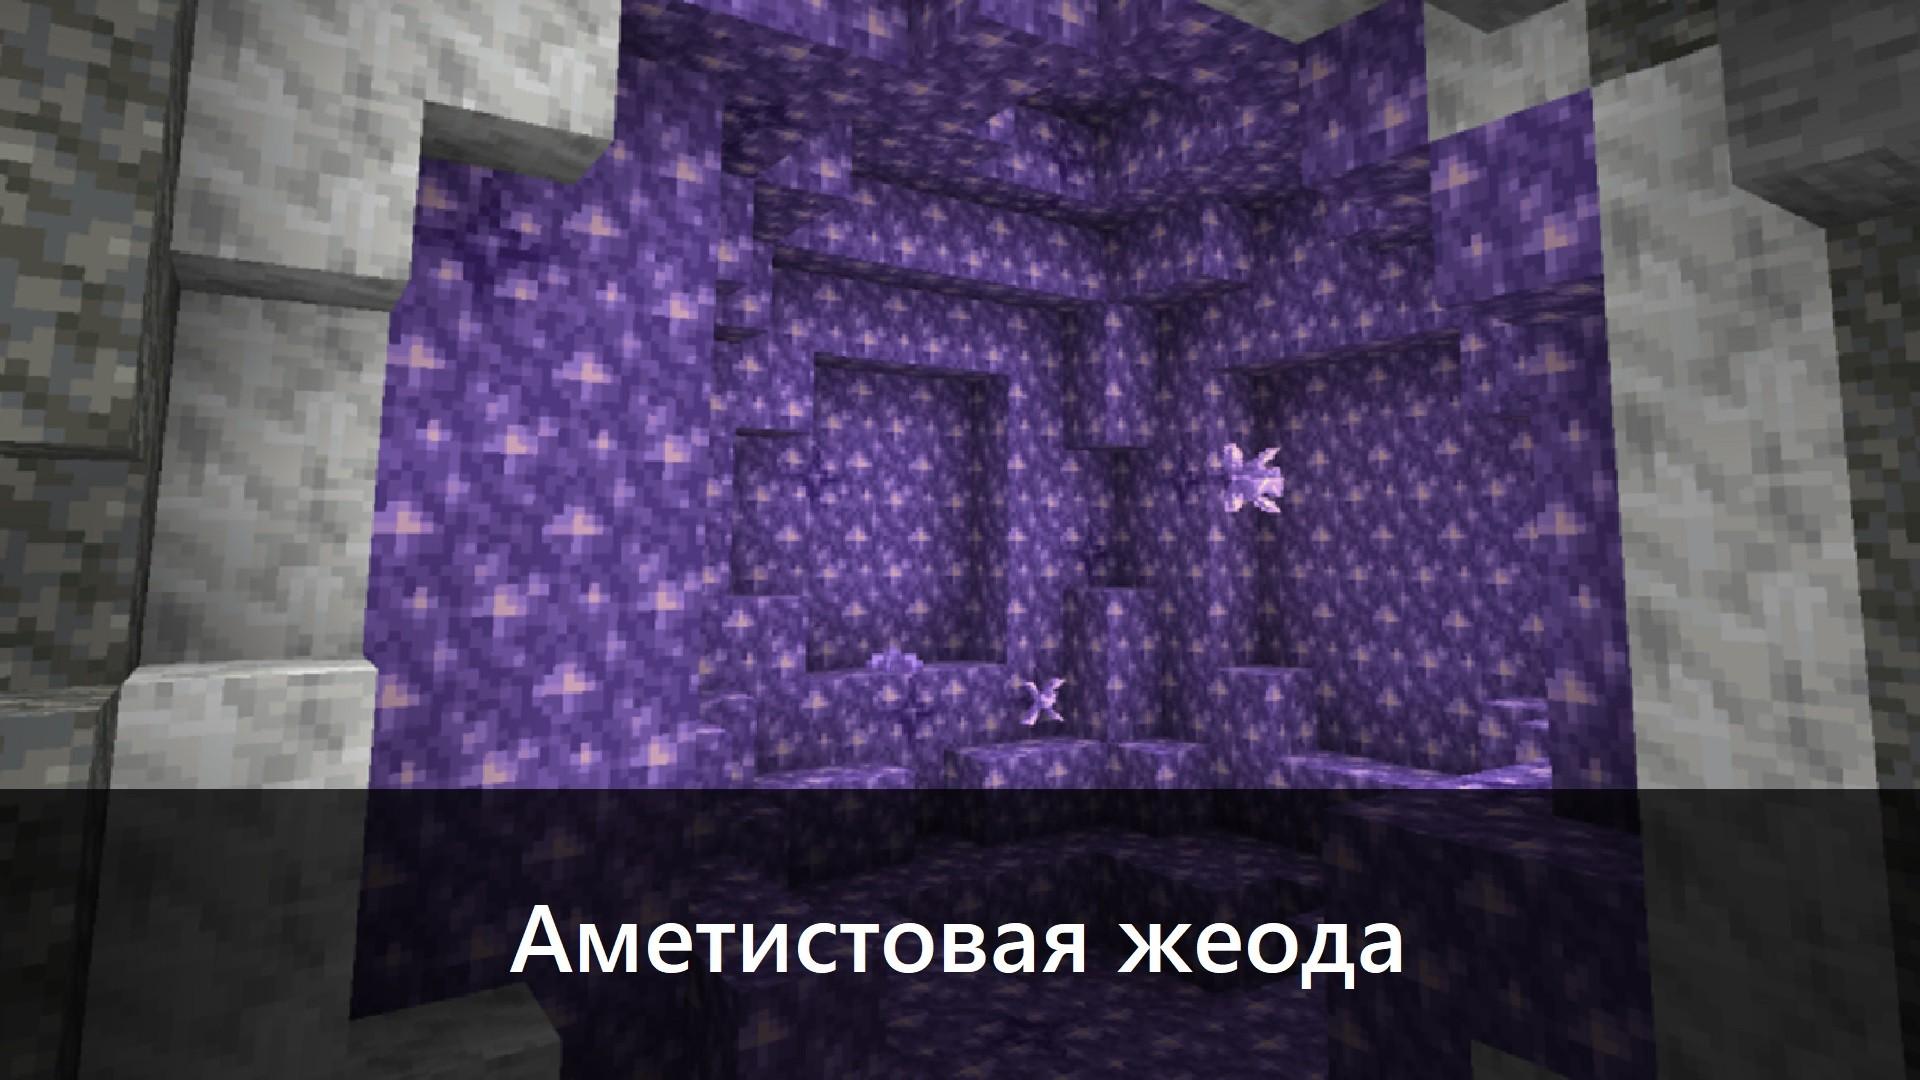 Аметистовая жеода в Майнкрафт ПЕ 1.17.0.58